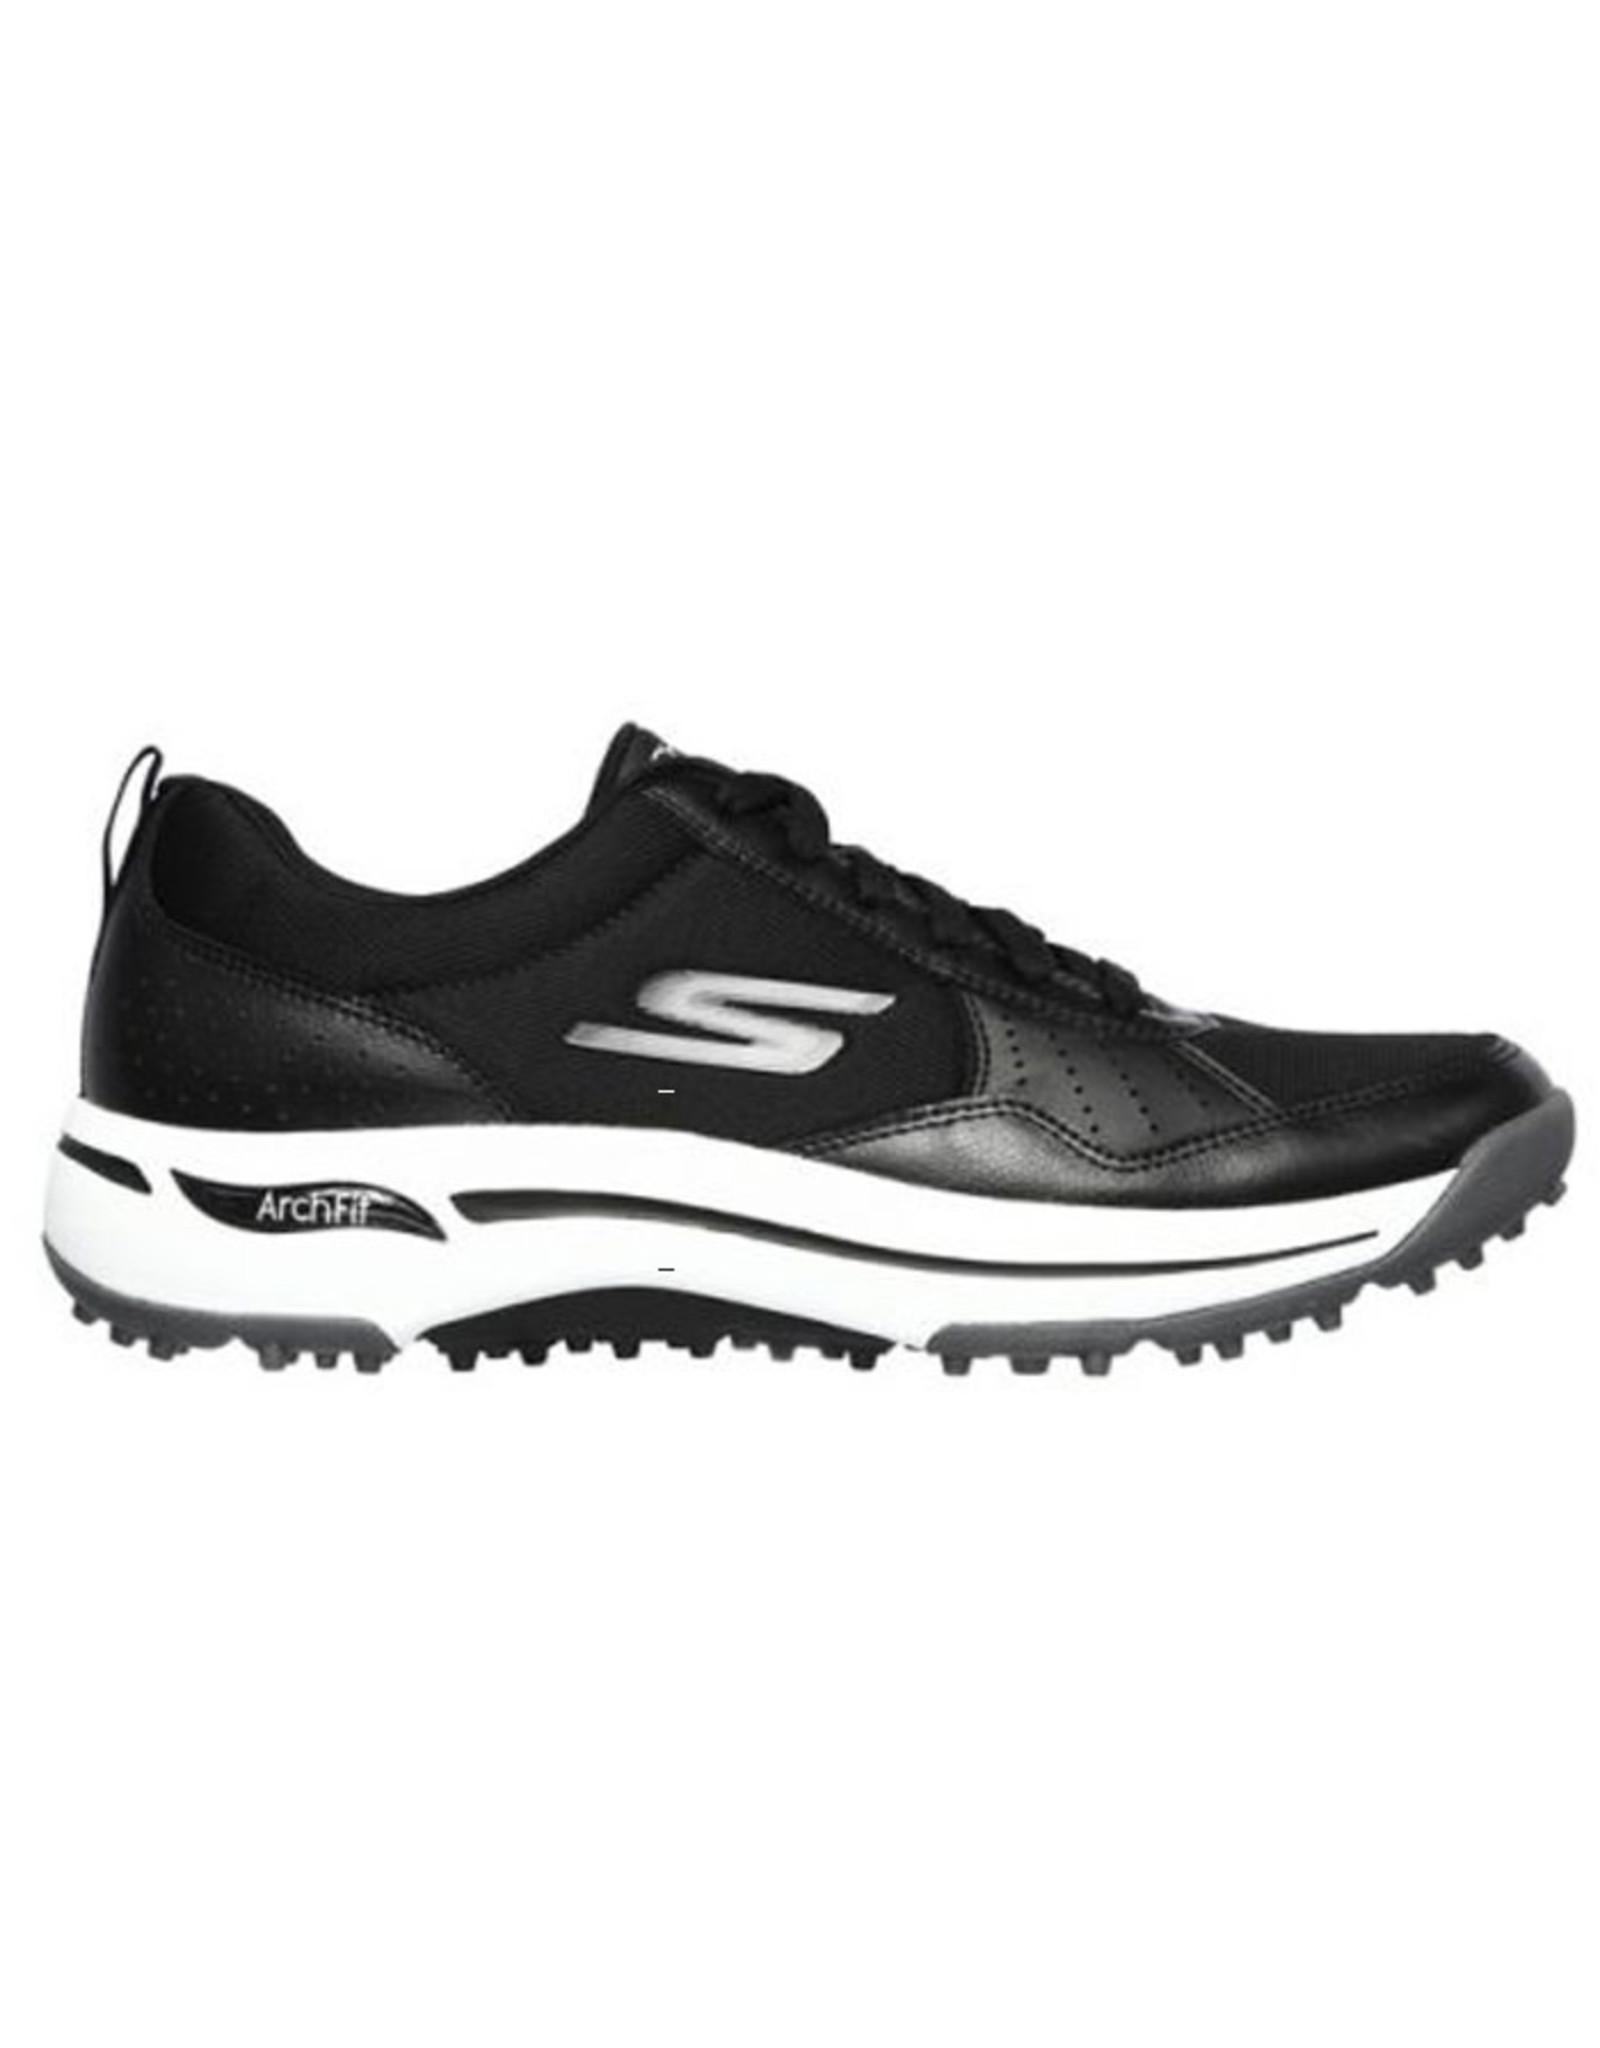 Skechers Skechers Go Golf Arch Fit Men's Shoes